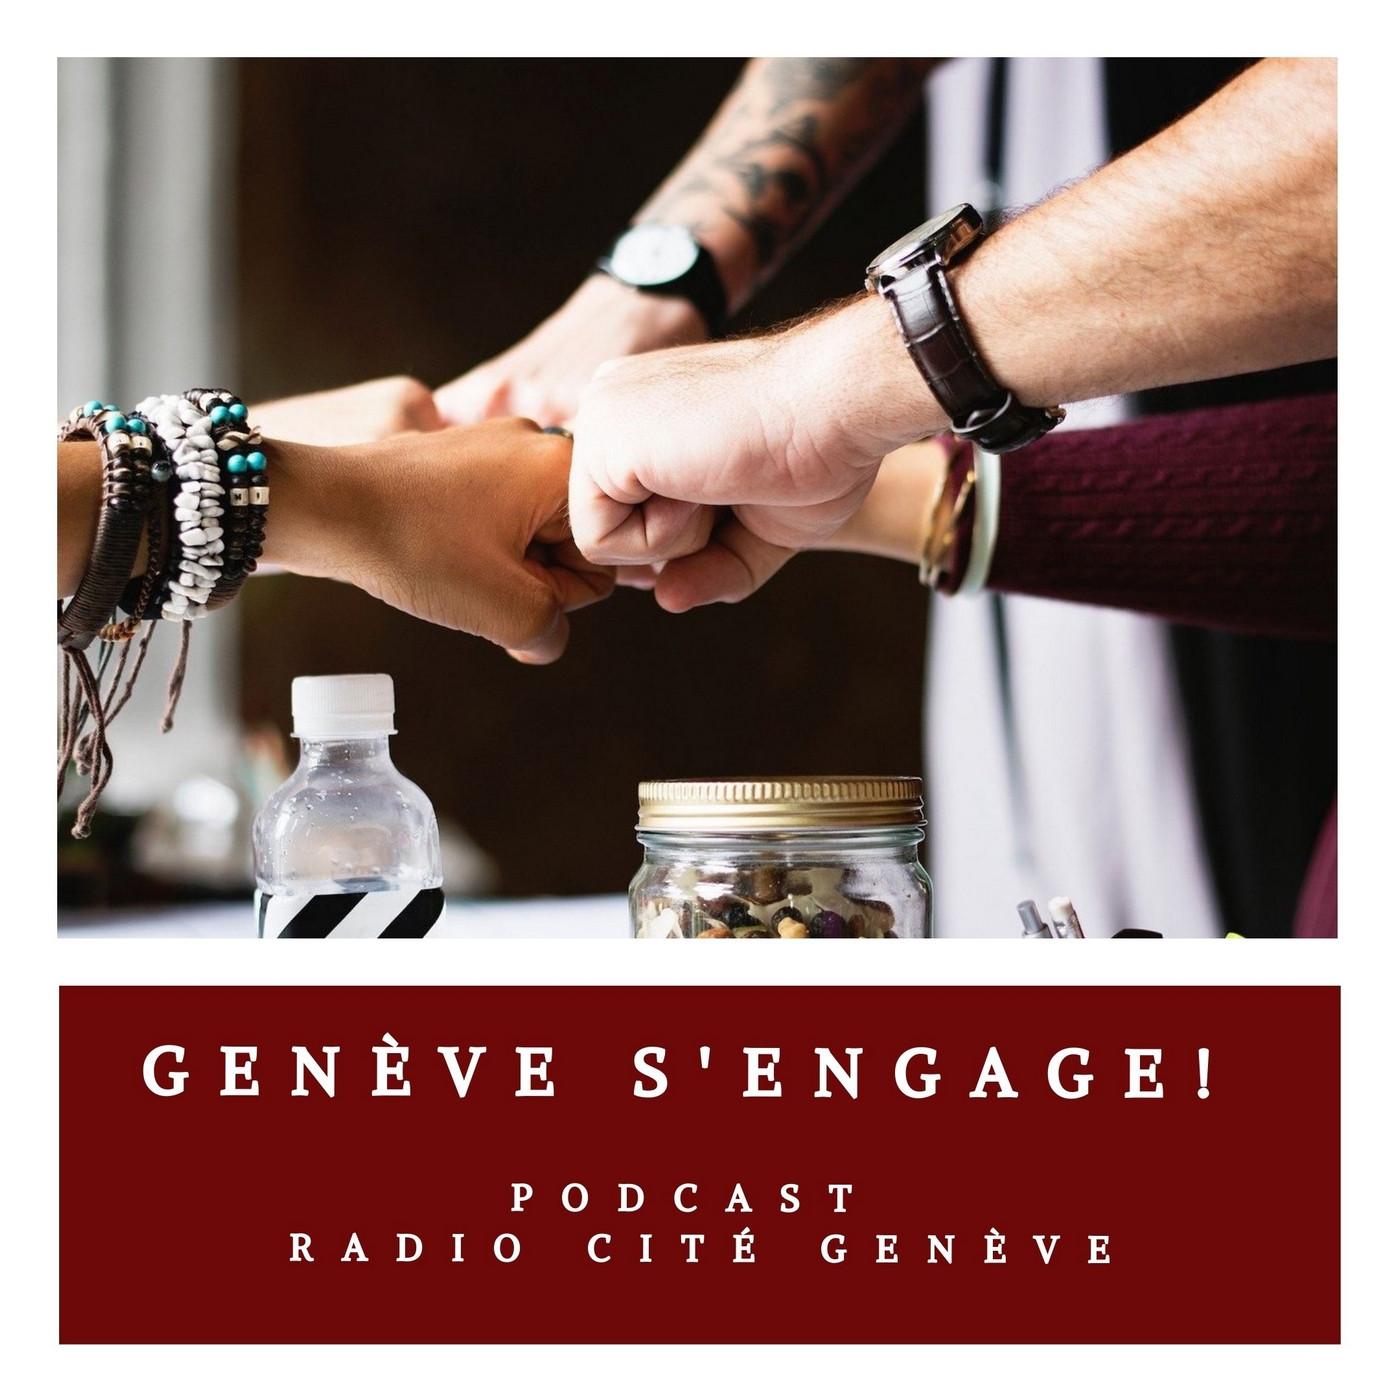 Genève s'engage ! - 28/09/2020 - Christian Wilhelm